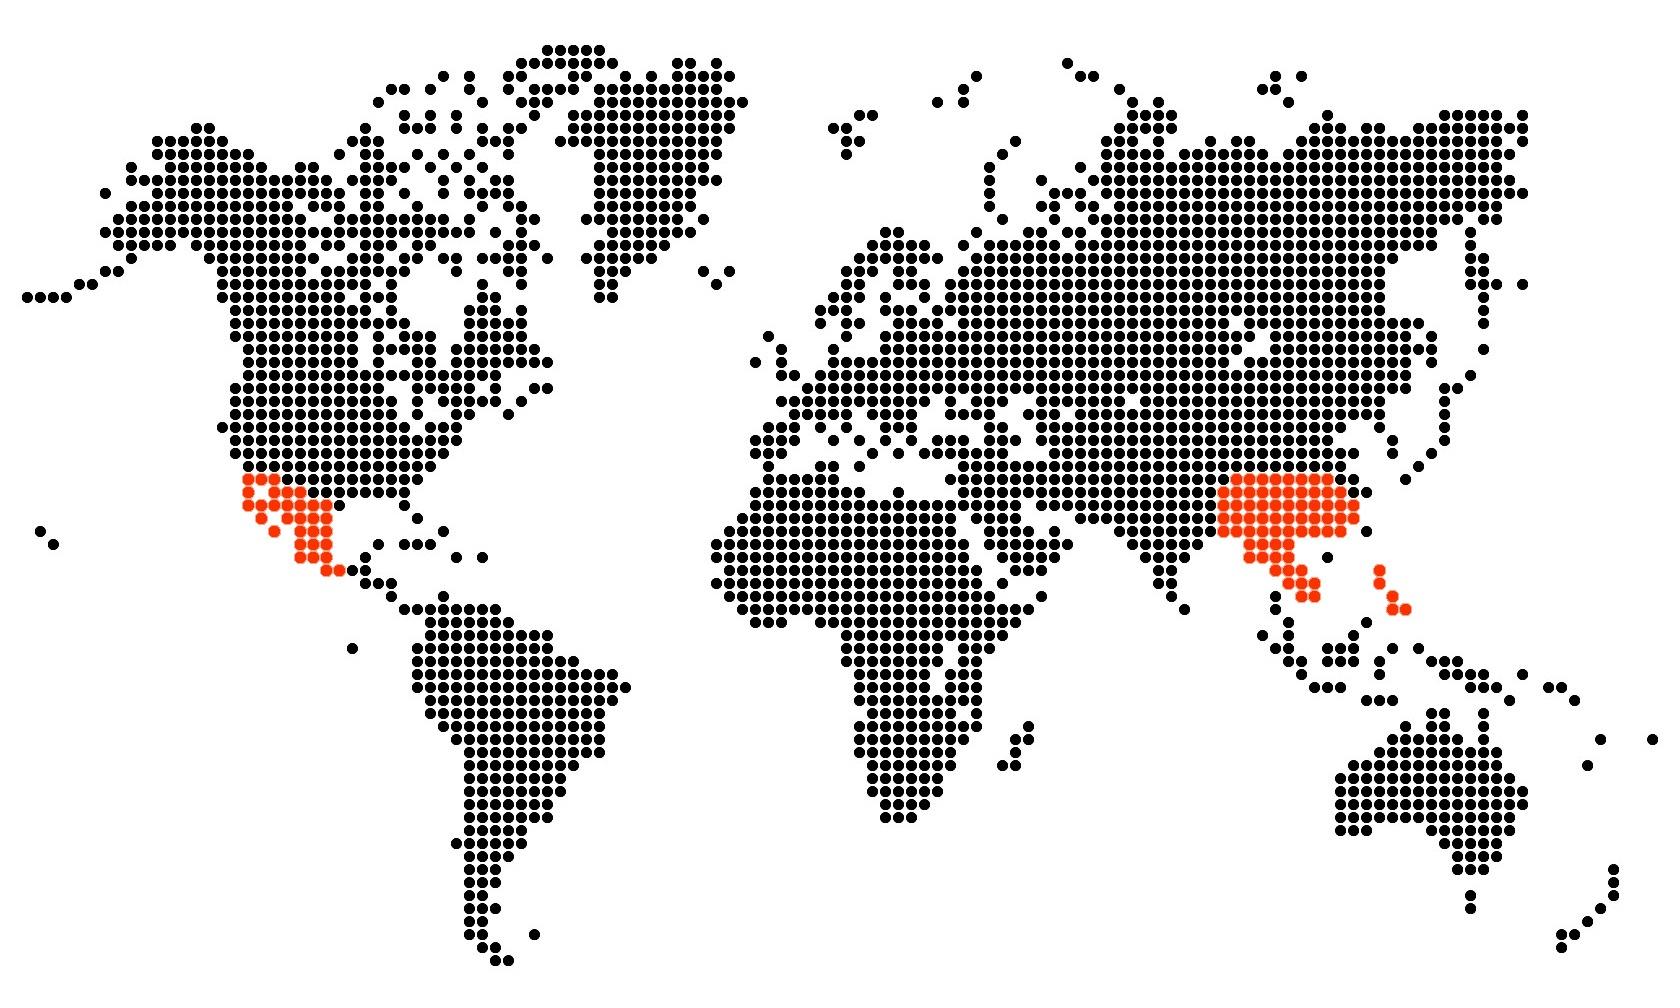 where_we_work_map.jpg